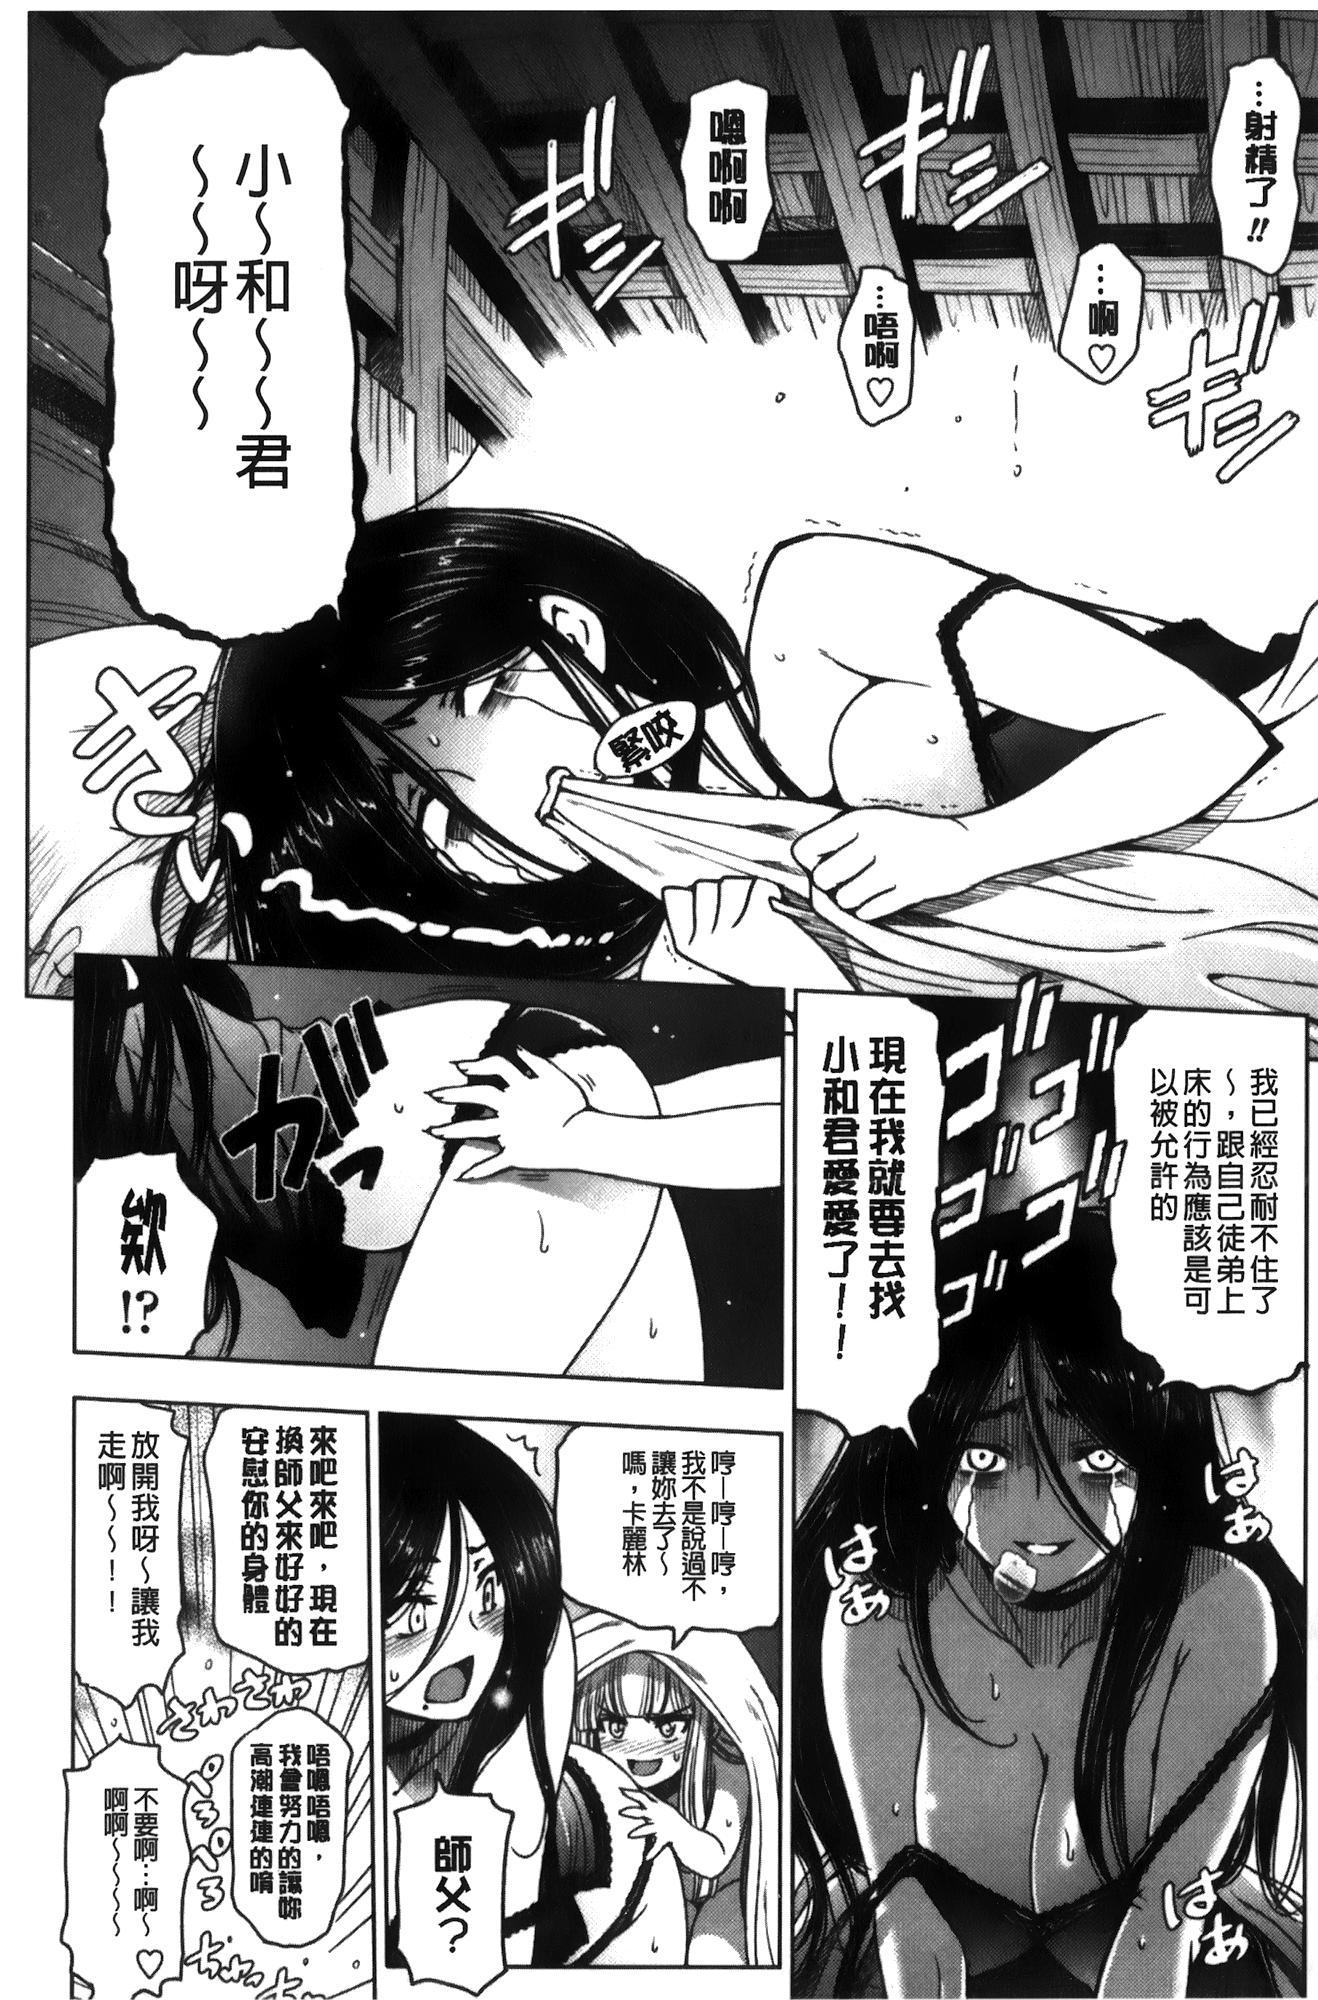 Majo × Shota ~ Genteiban | 魔女X小正太 限定版 176